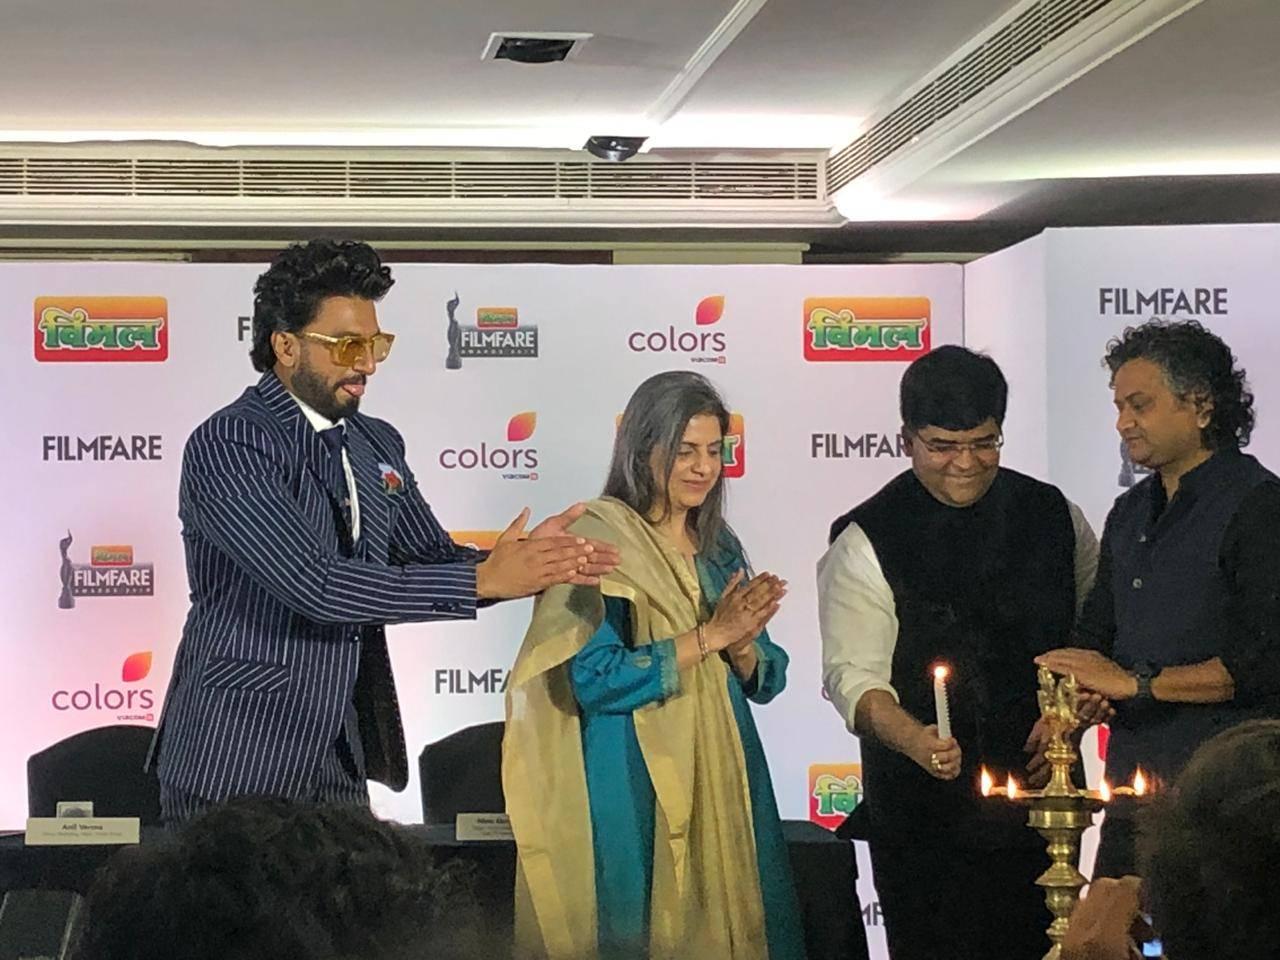 Filmfare 2019 (5).